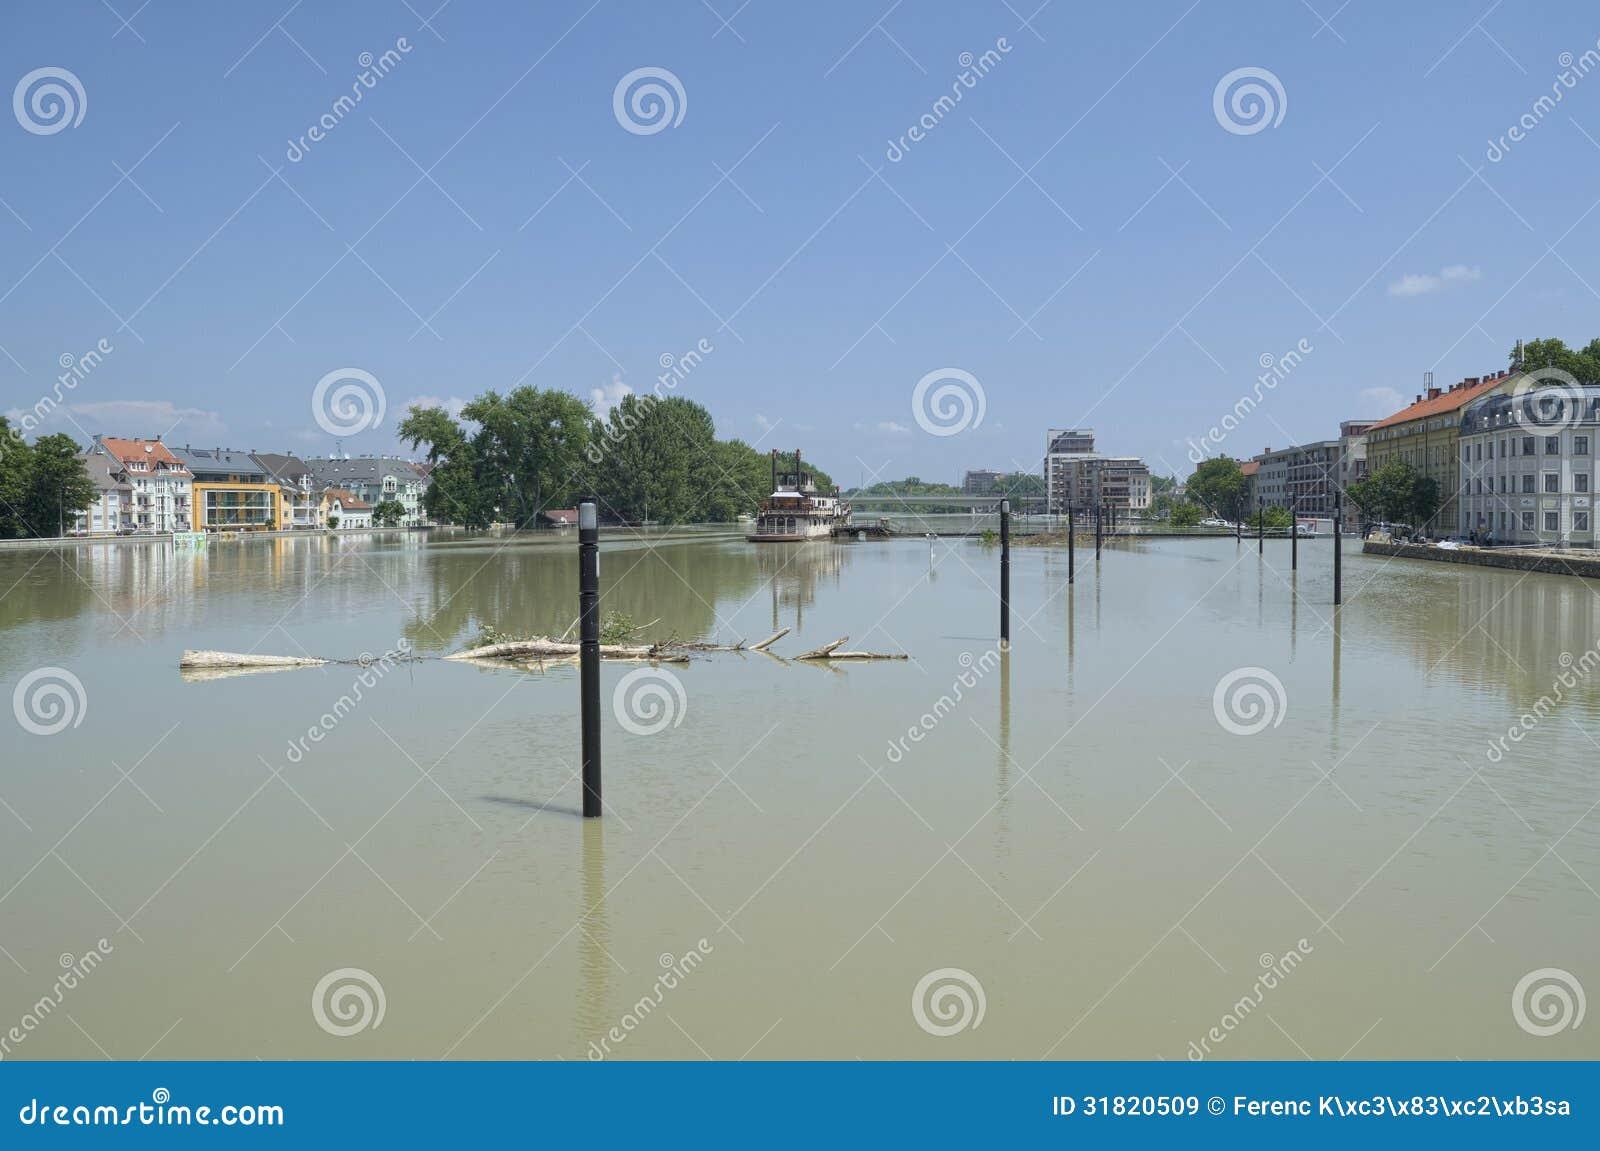 Gyor Hungary Europe June 8th 2013 Flooding Danube